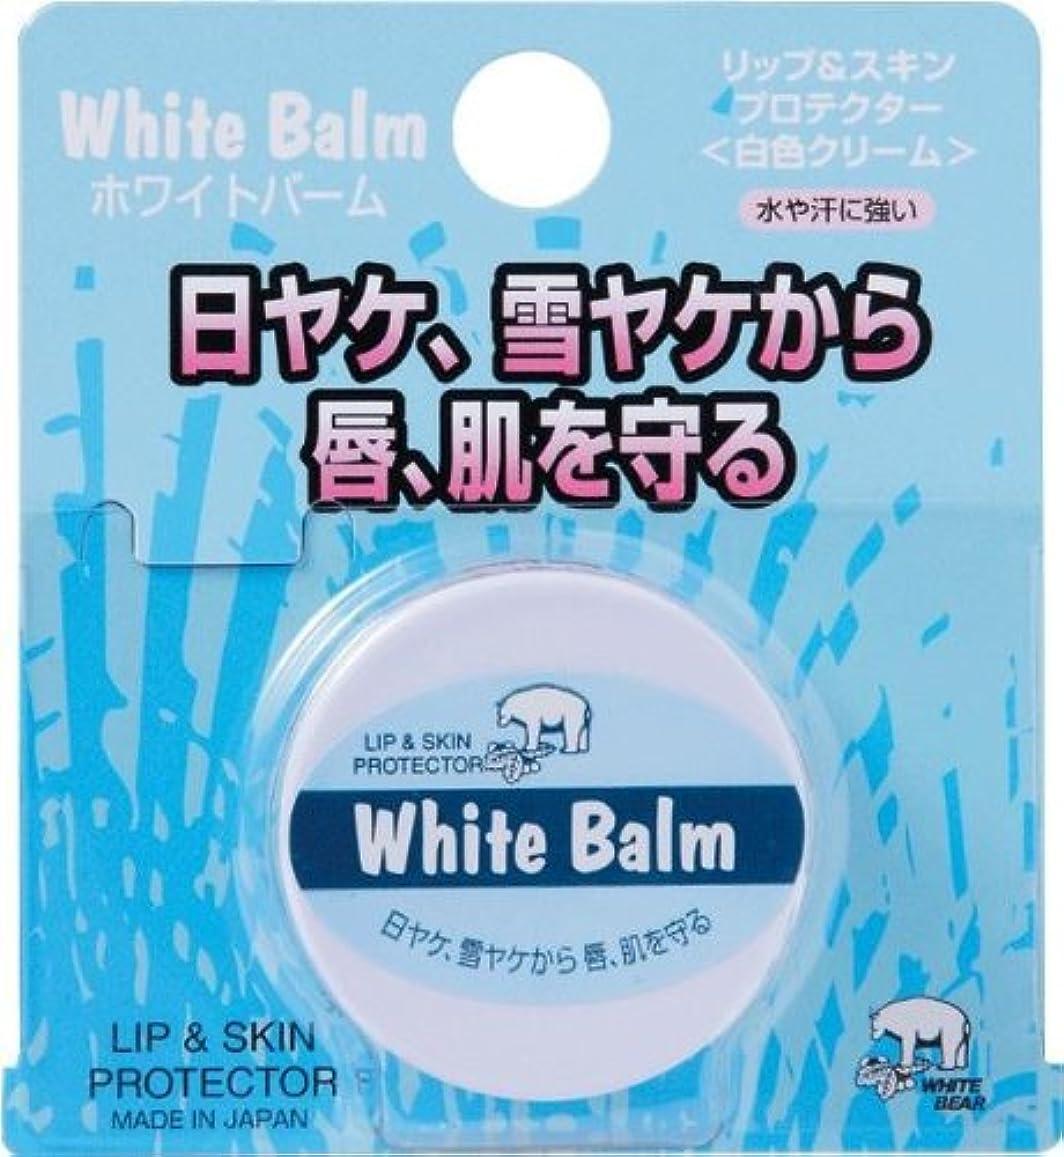 WHITE BEAR(ホワイトベアー) ホワイトバーム オールシーズン 9g×12個セット No.555【同梱?代引不可】